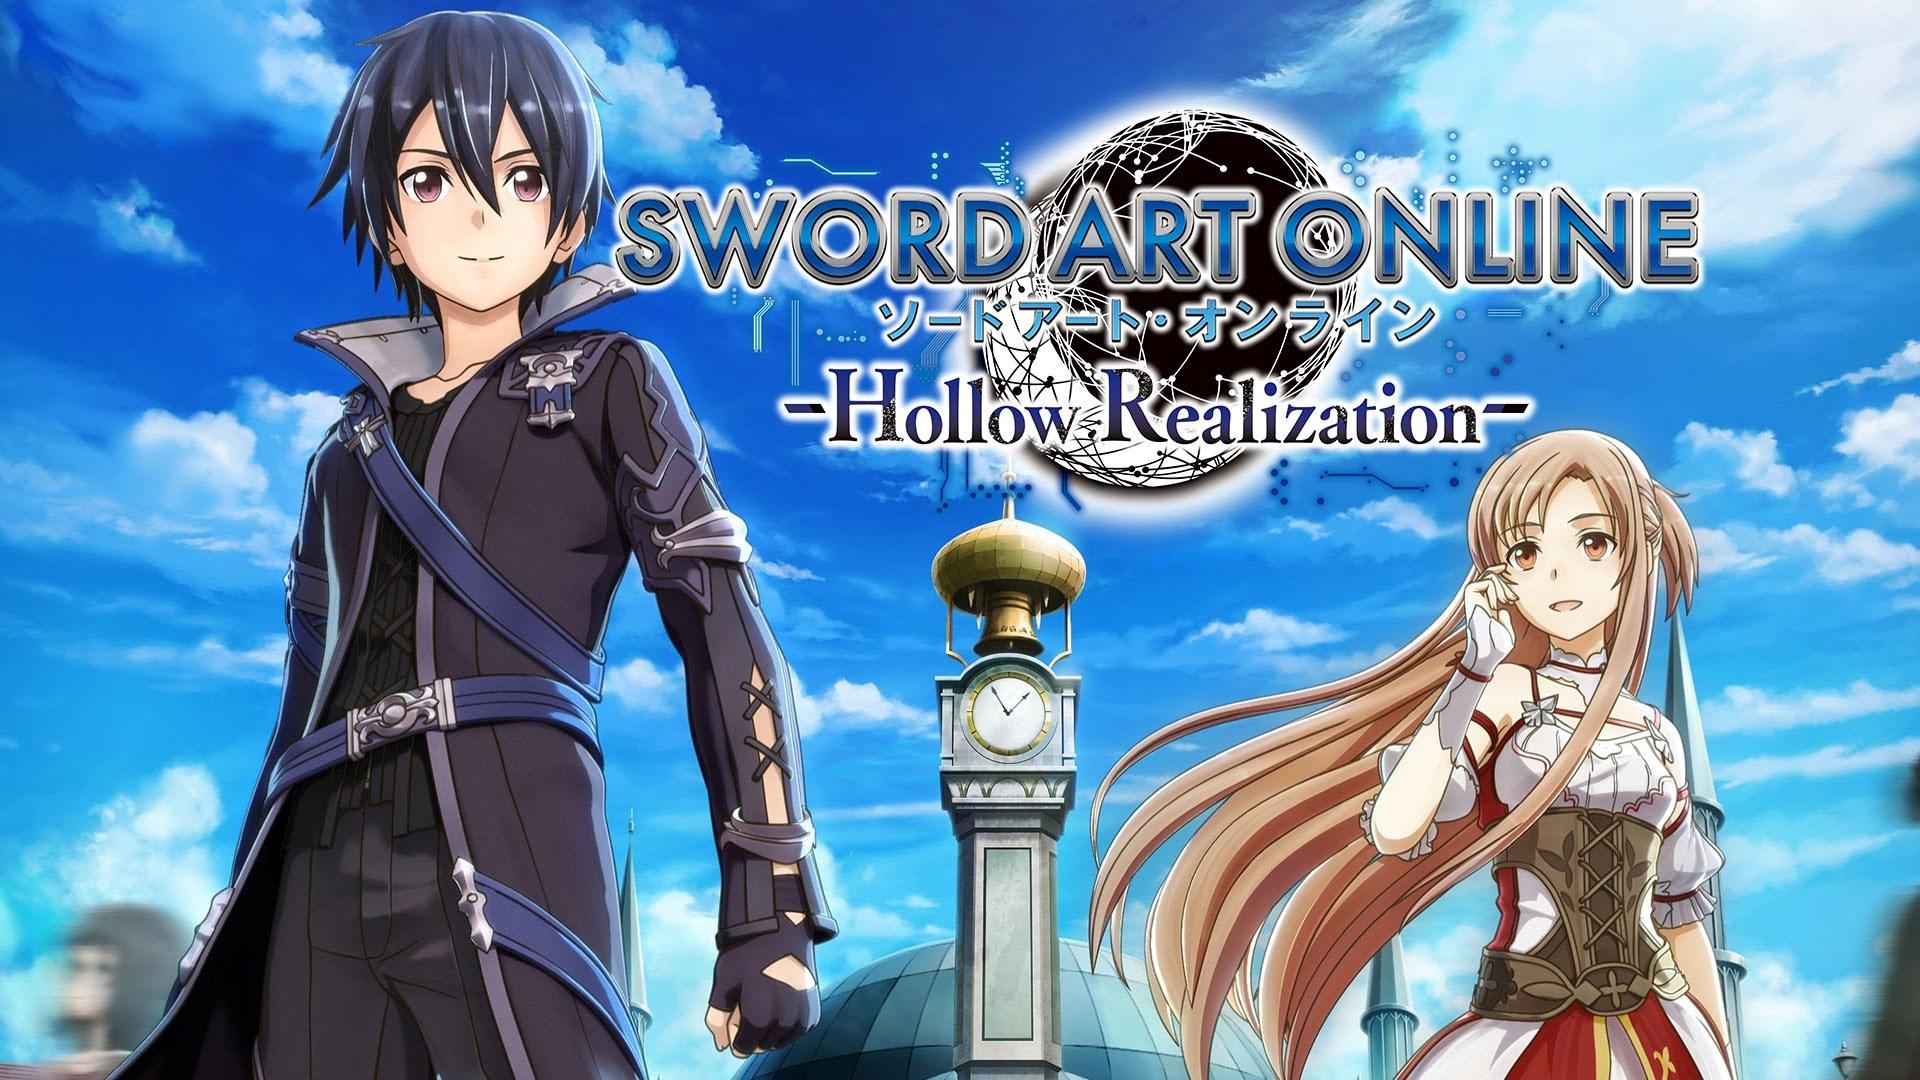 SWORD ART ONLINE: Hollow Realization Deluxe Edition